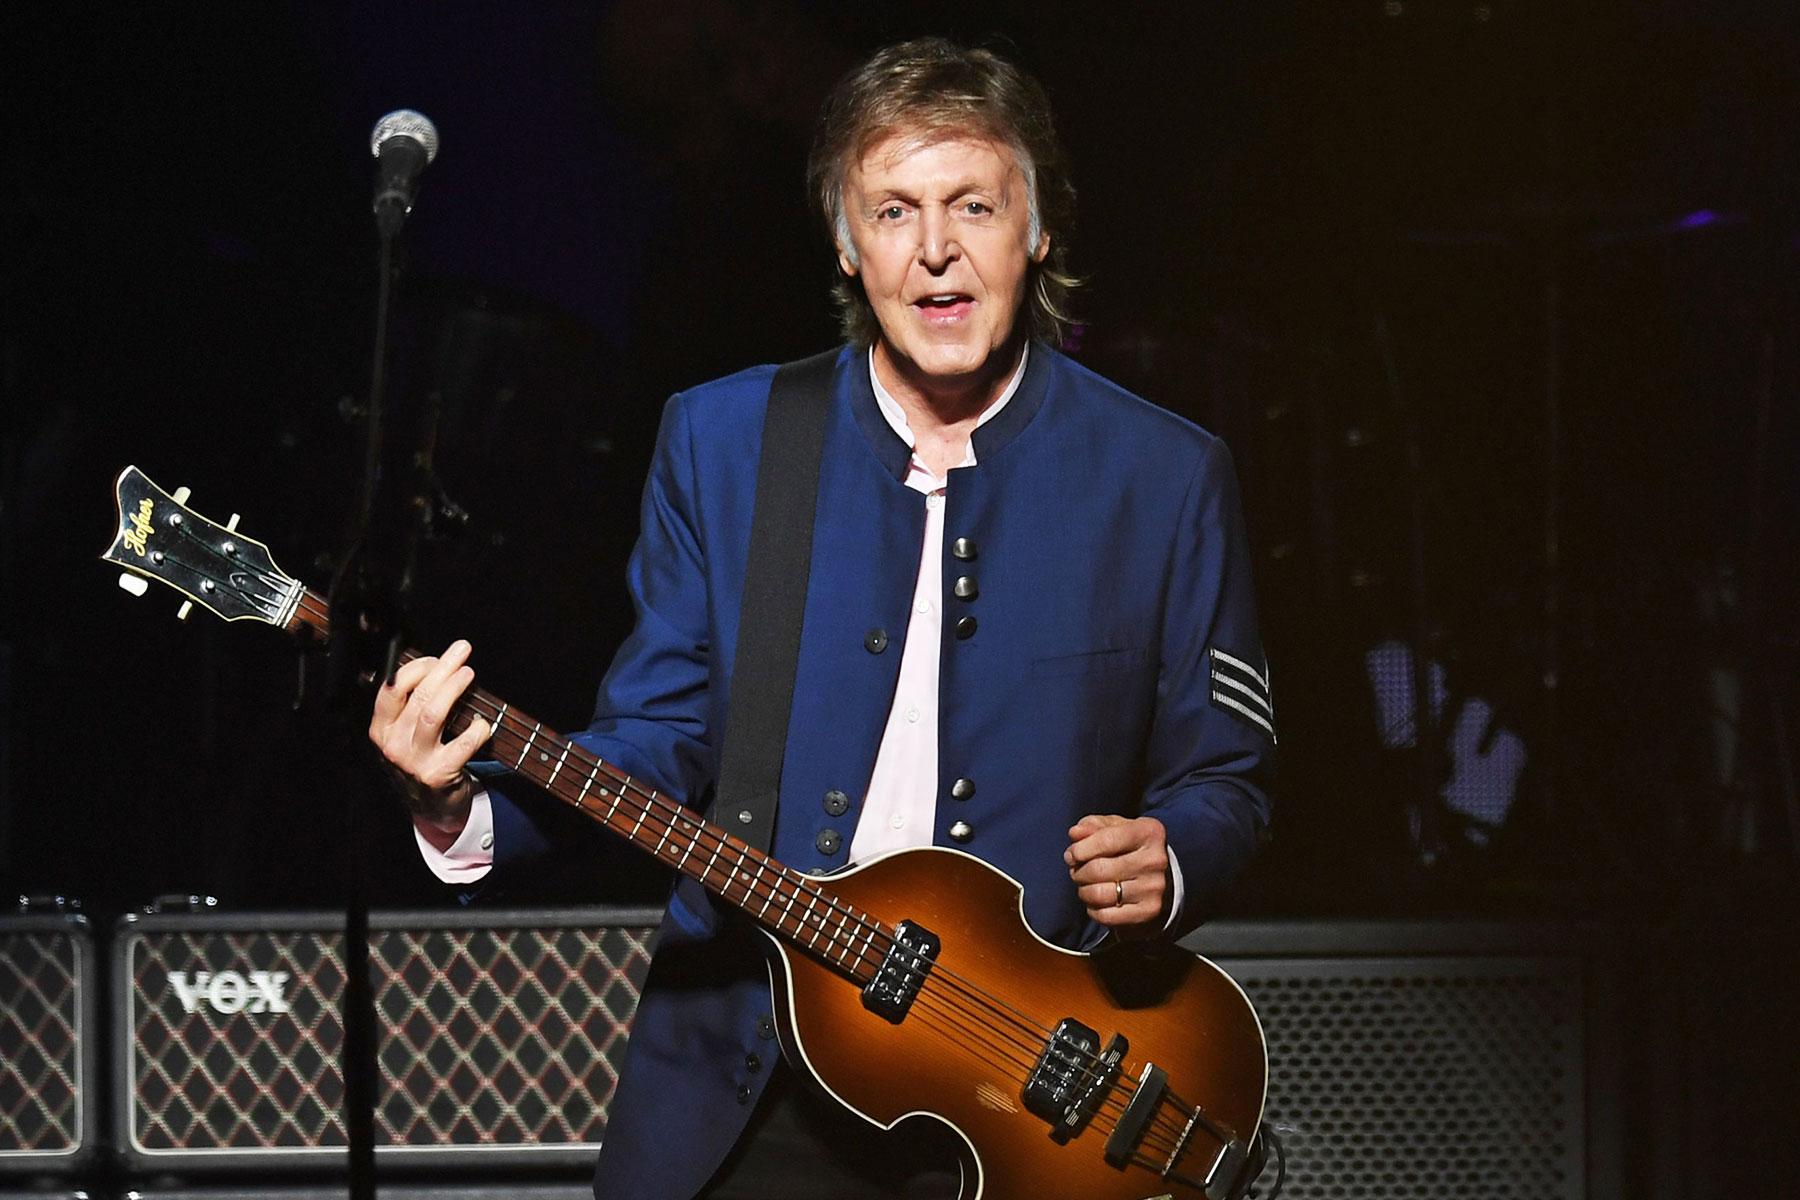 Hear Paul McCartney's Poppy, 'Raunchy' New 'Fuh You